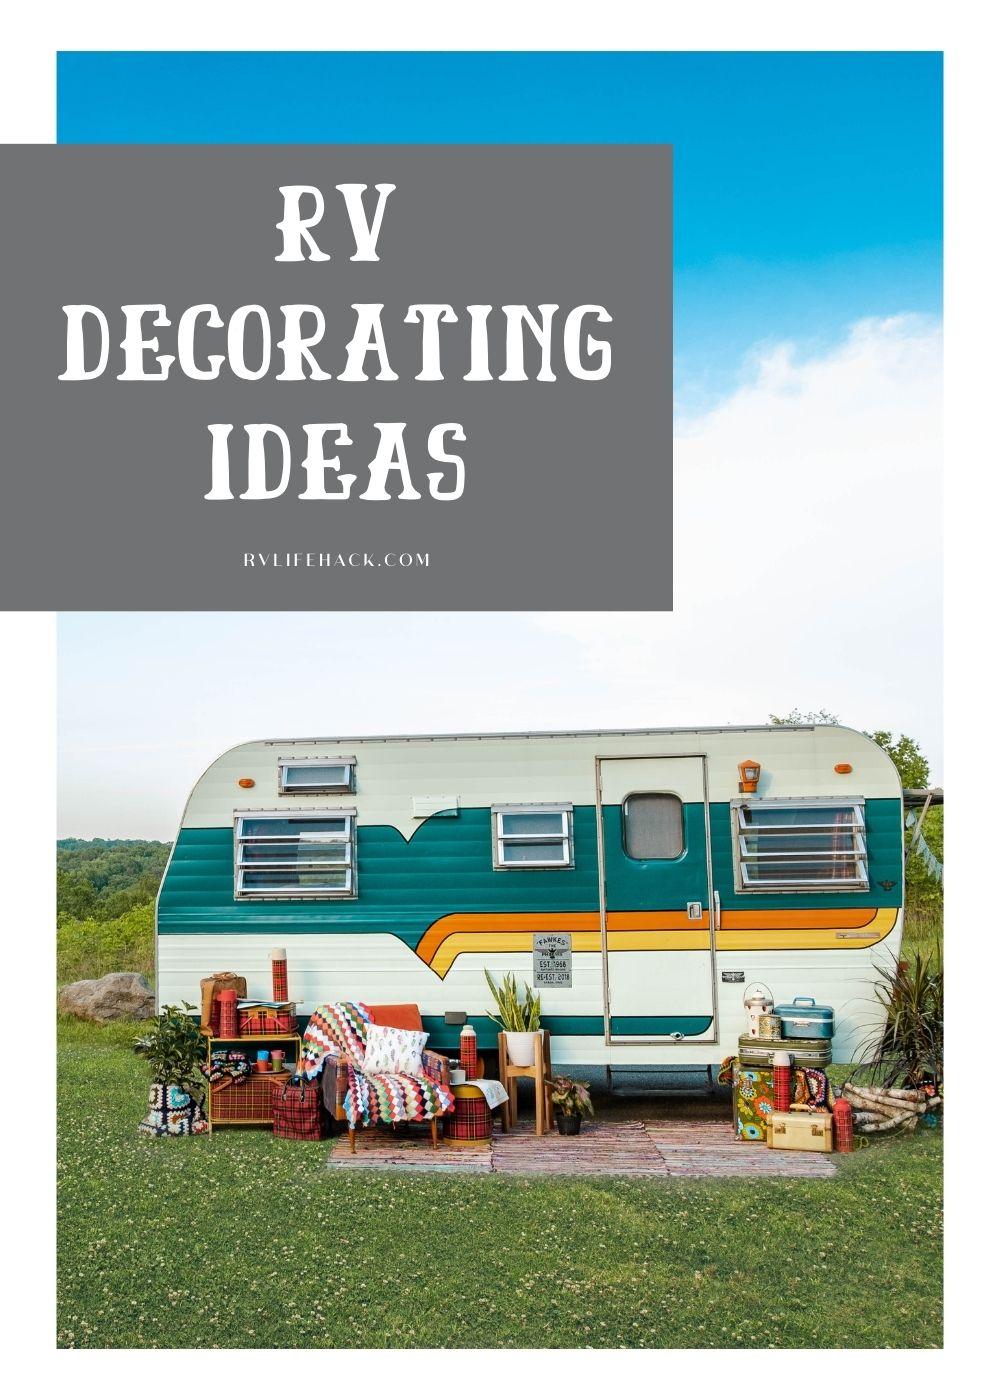 40+ RV Decorating Ideas 2021: Remodelling Camper Exterior